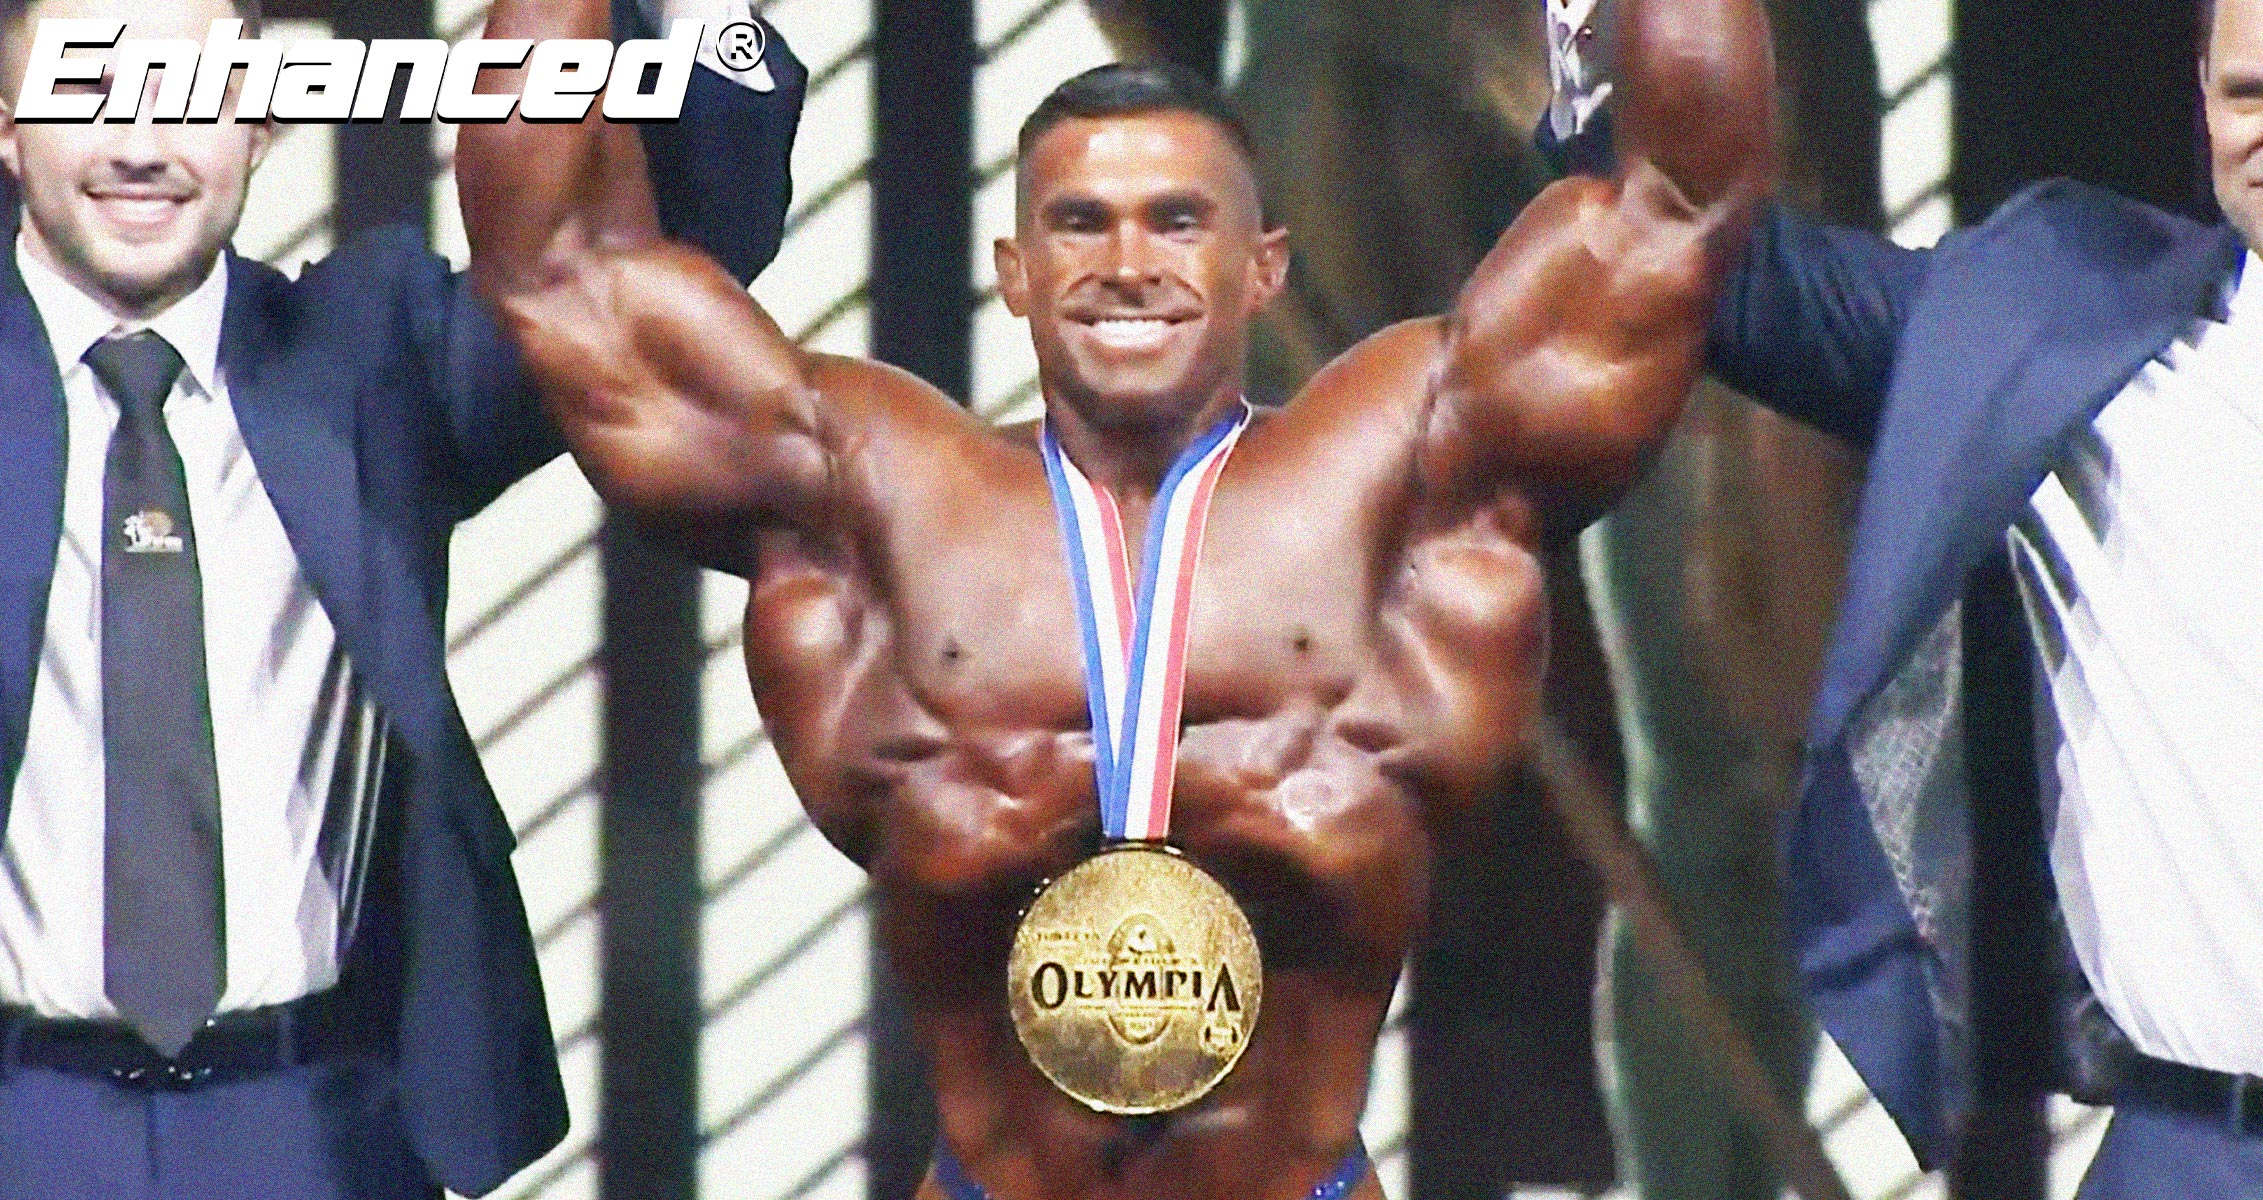 Men's 212 Finals Olympia 2021